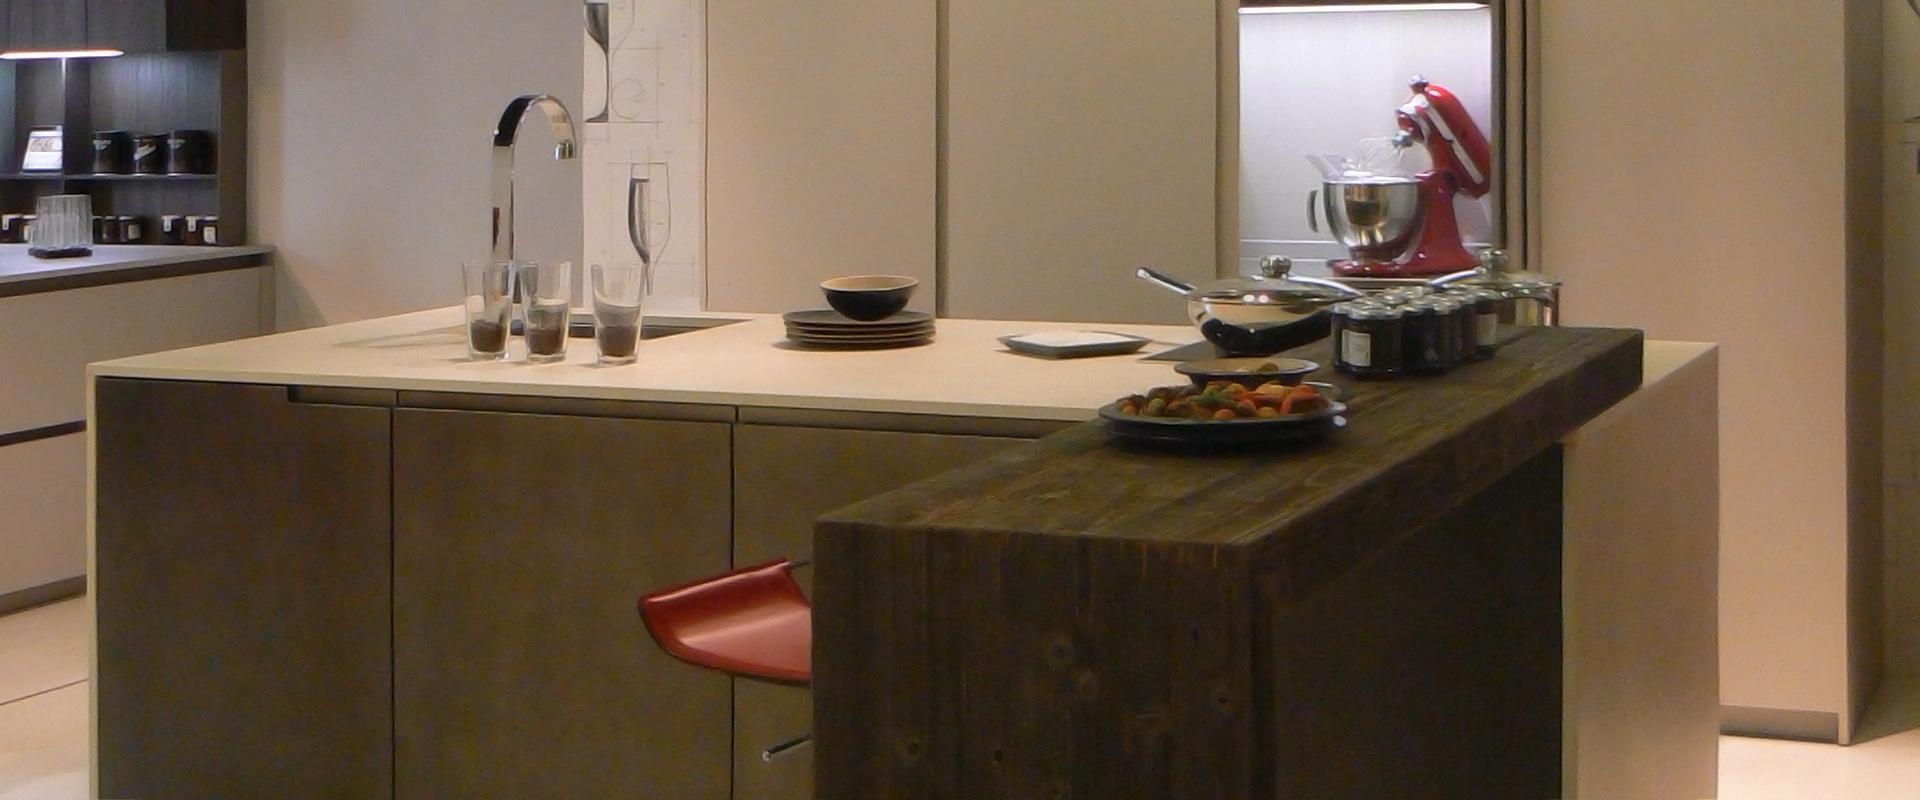 Store cucine arredamenti mantova ponti arredamenti dal for Arredamenti mantova